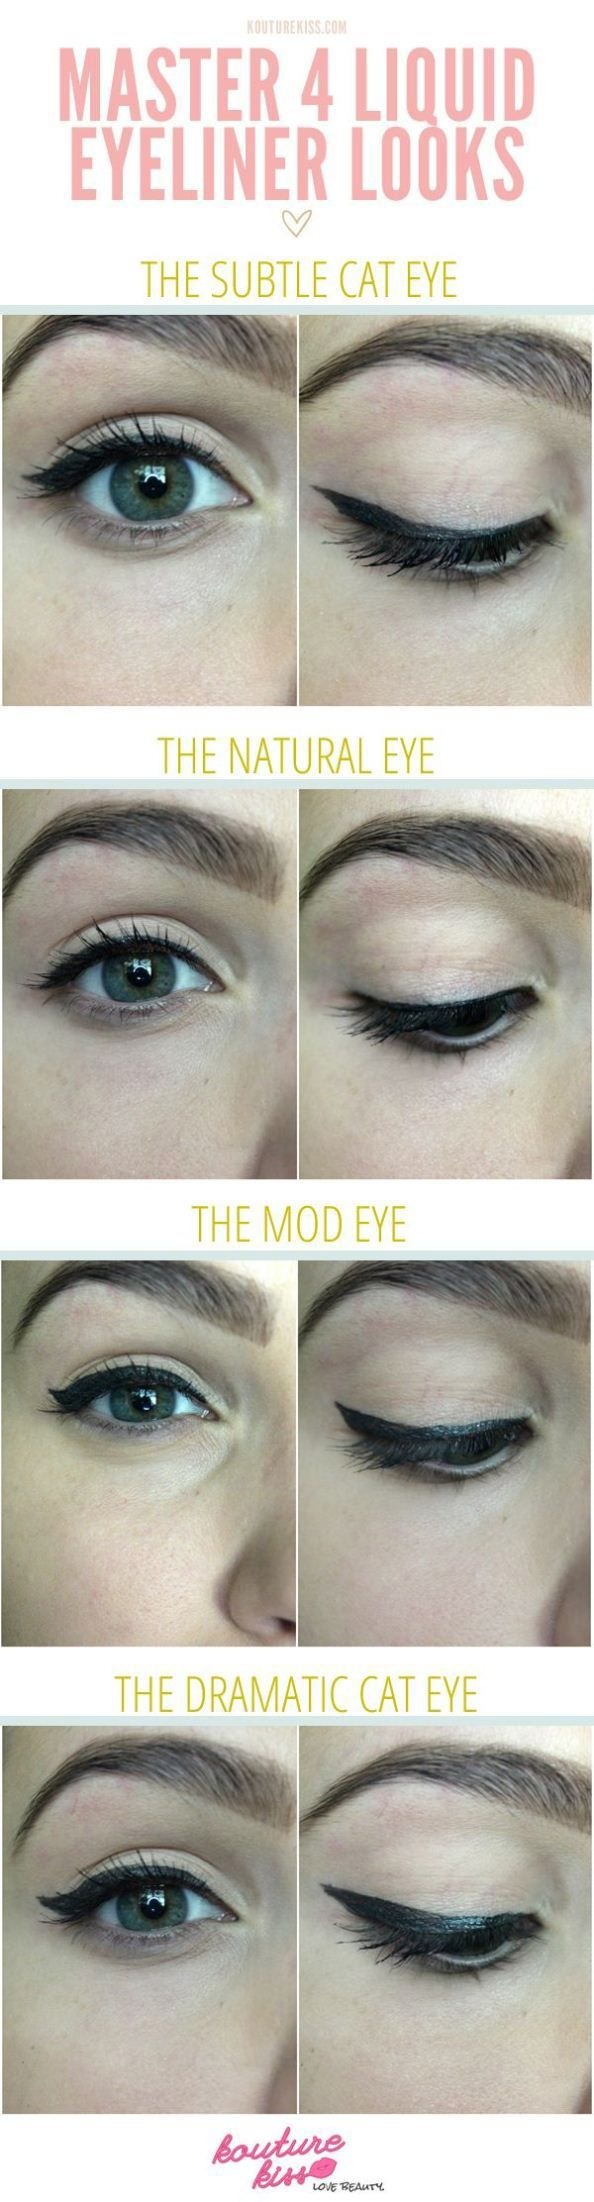 9 Liquid Eyeliner Tips, Tricks & Hacks for Perfect Cat-Eye  Gurl